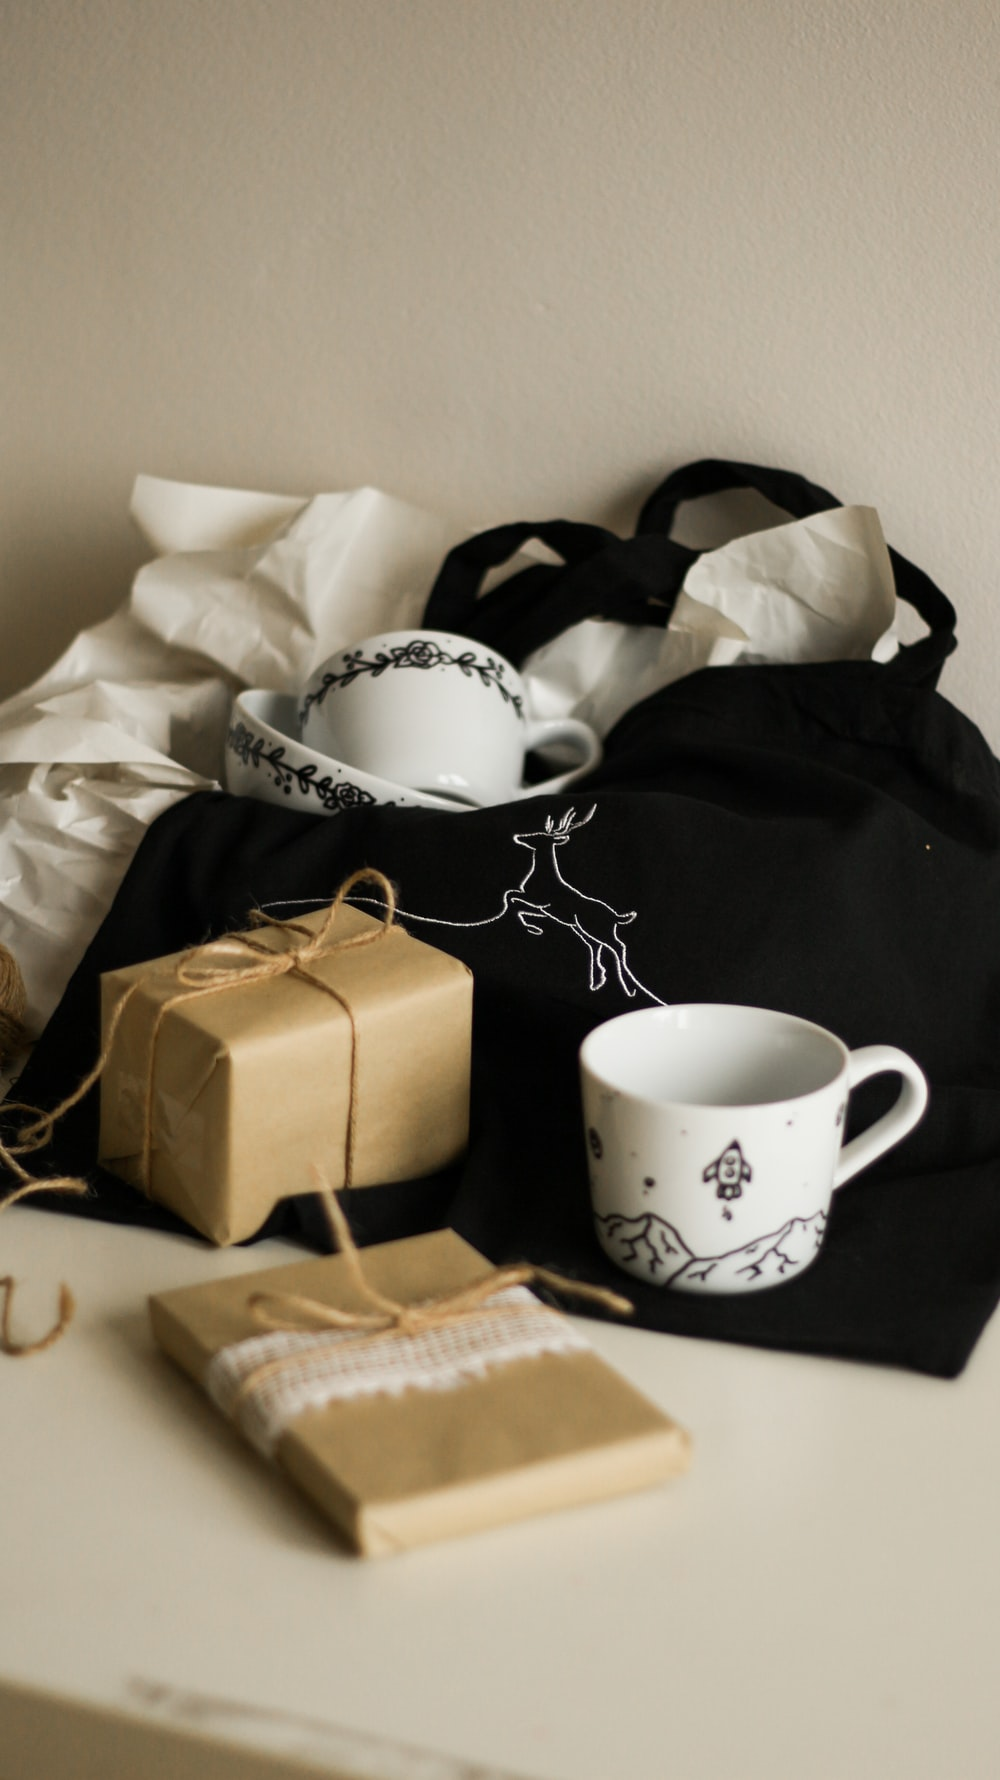 white ceramic mugs on black textile